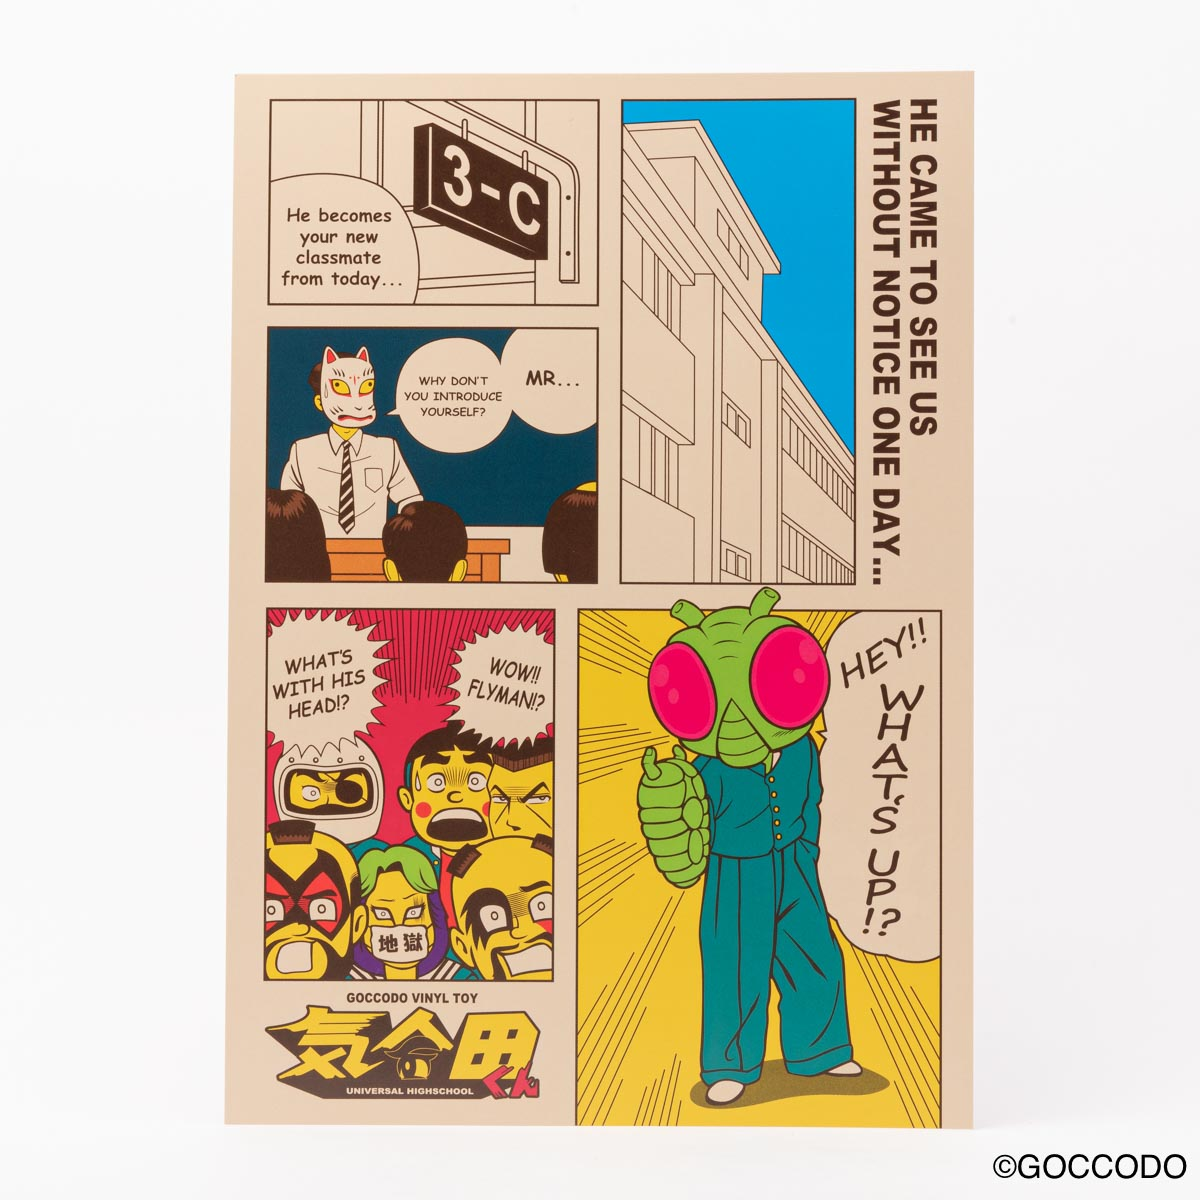 GOCCODO -KIAIDANJI [Pearl Gray] SMASH Shorts ver.- HKDSTOY Limited Color